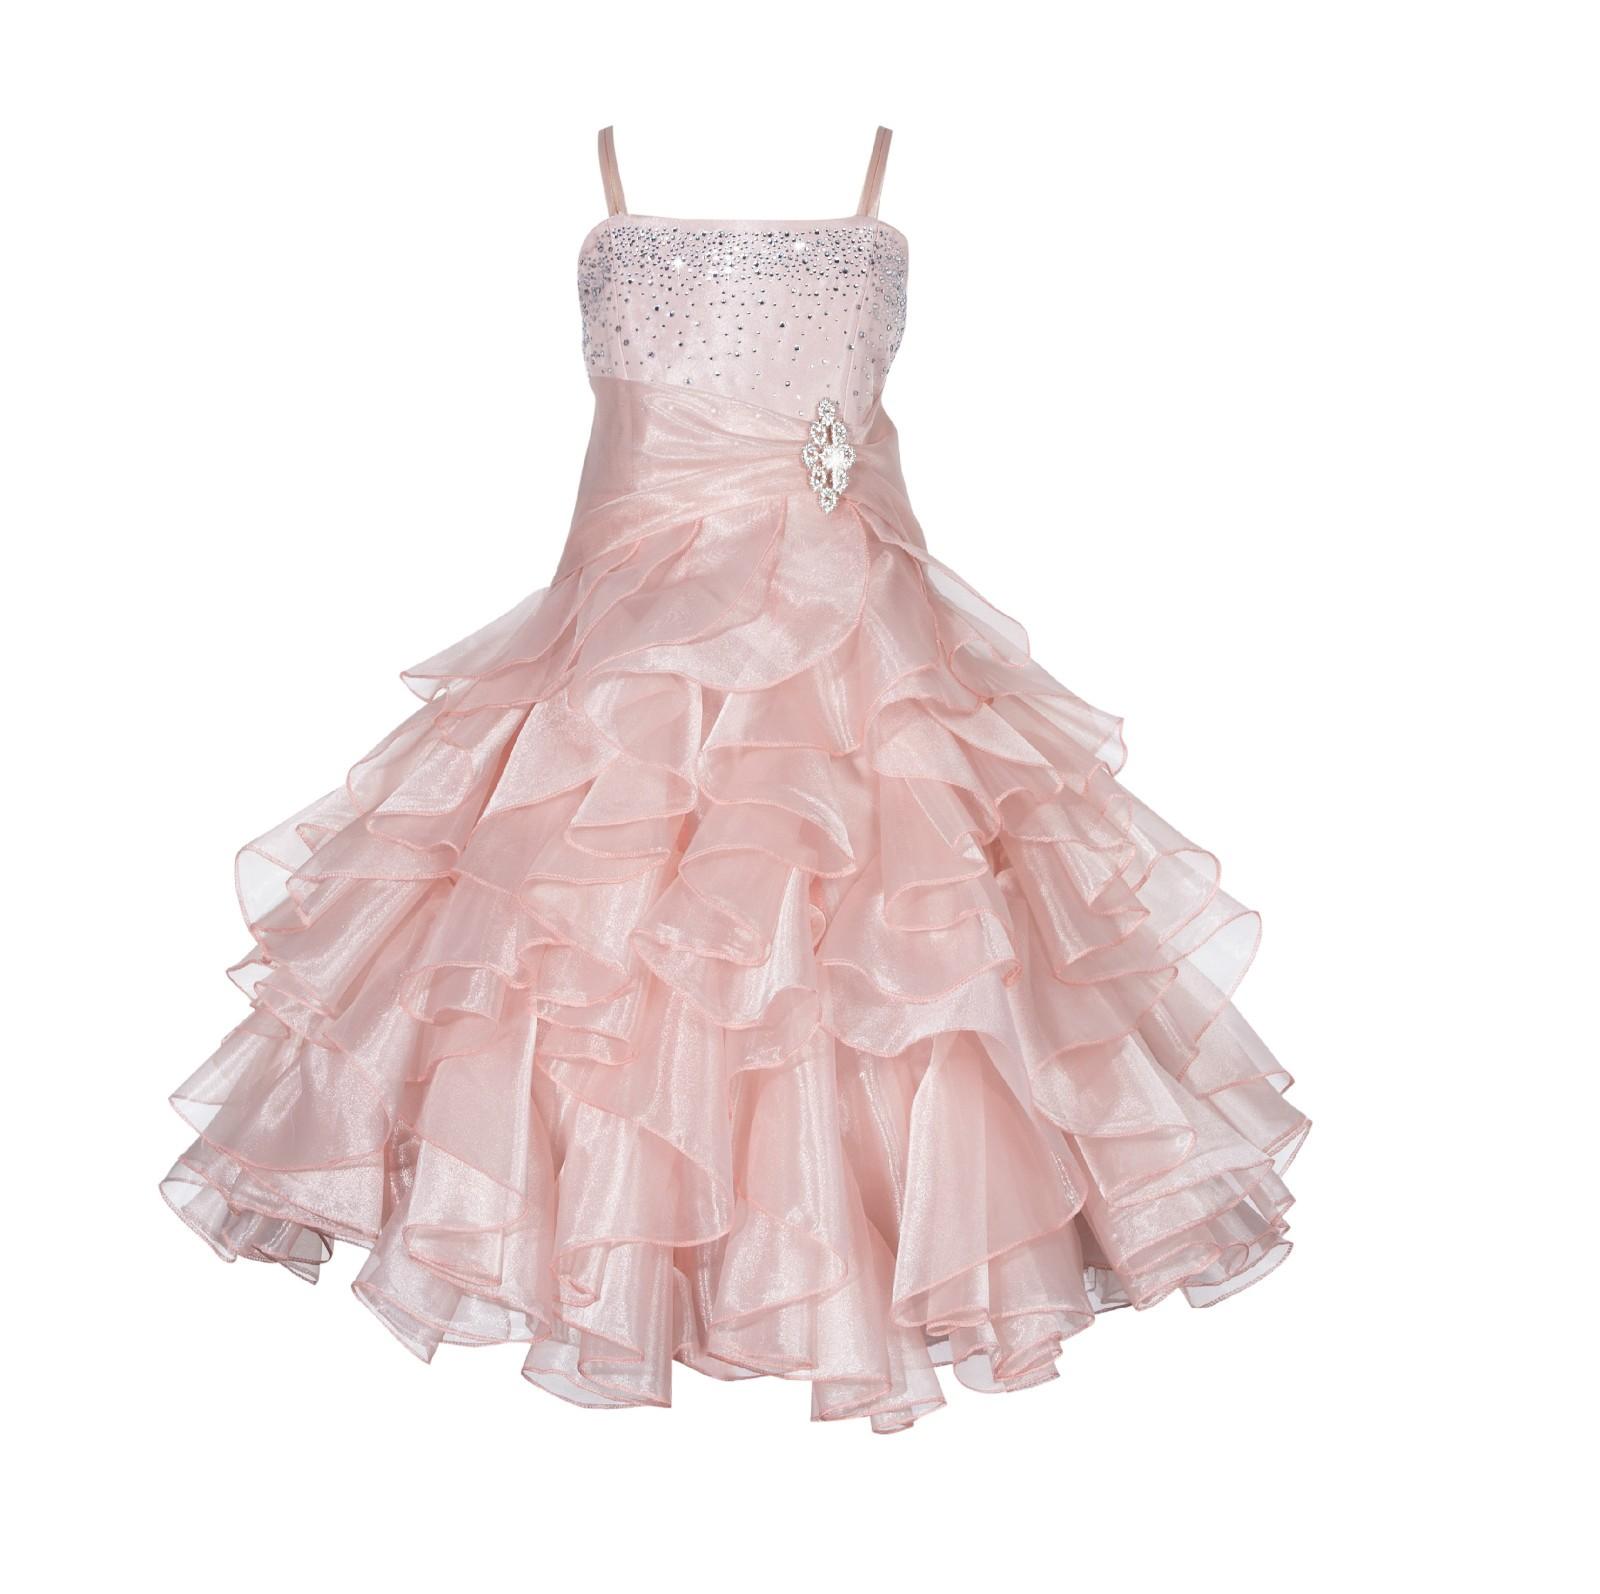 Blush Pink Rhinestone Organza Layers Flower Girl Dress Elegant Stunning 164S